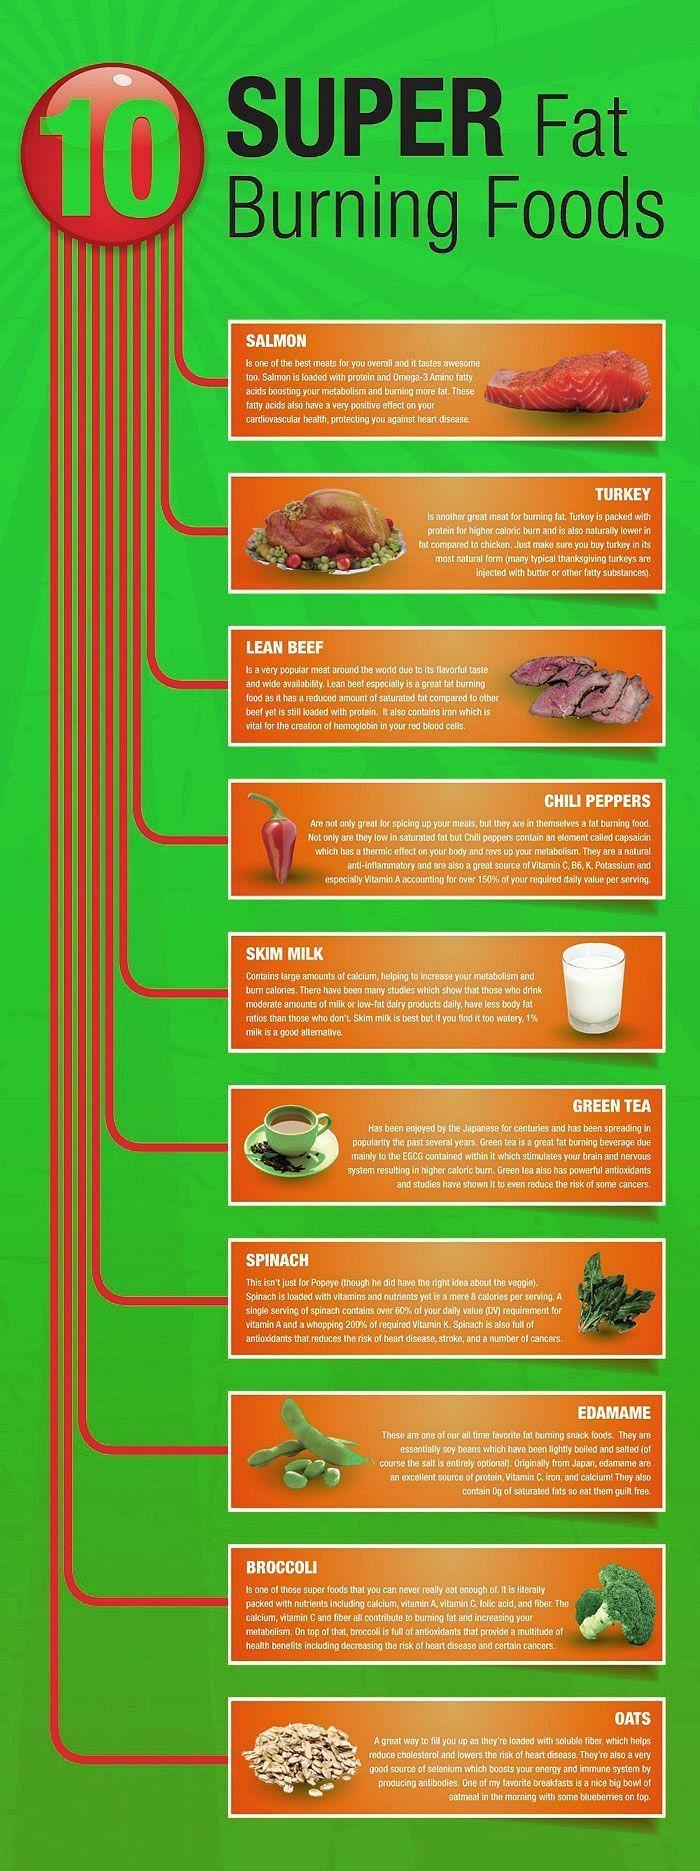 Best fat-burning foods. 10 super fat burning foods